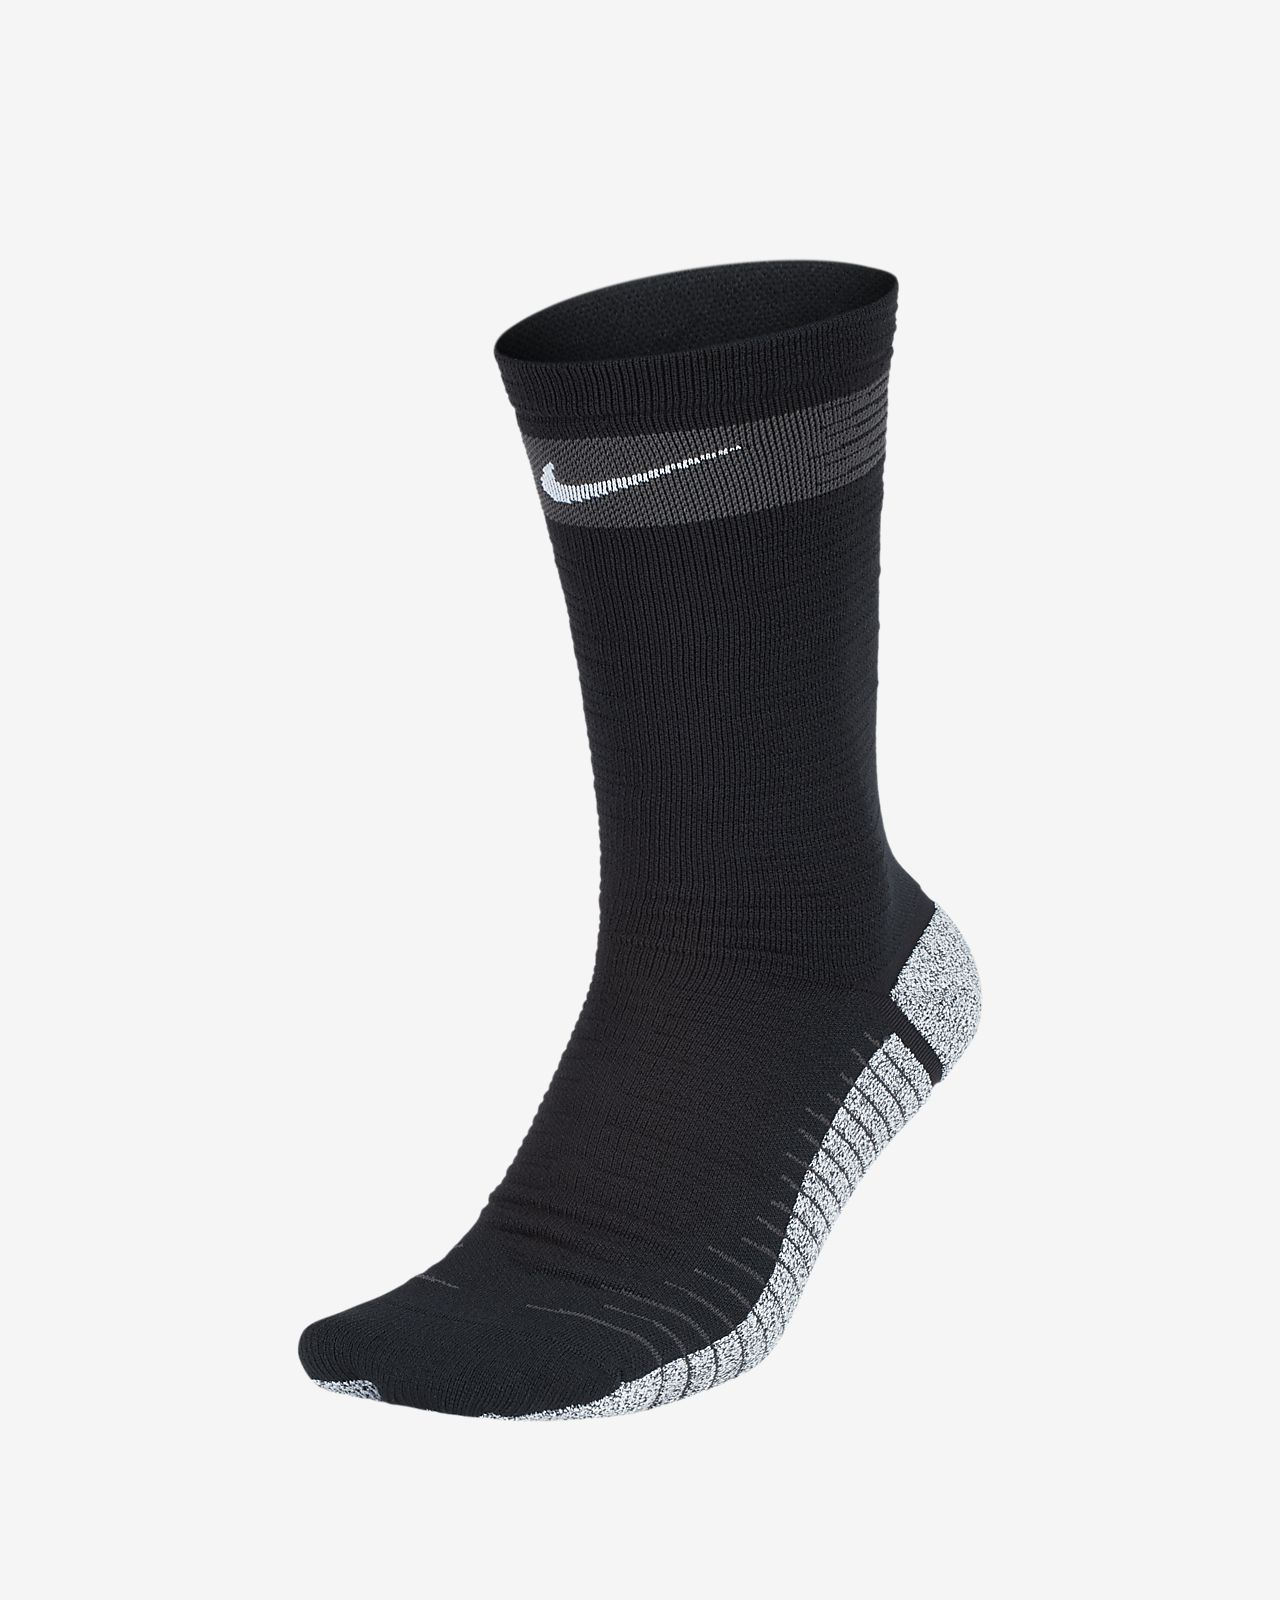 Футбольные носки NikeGrip Strike Light Crew